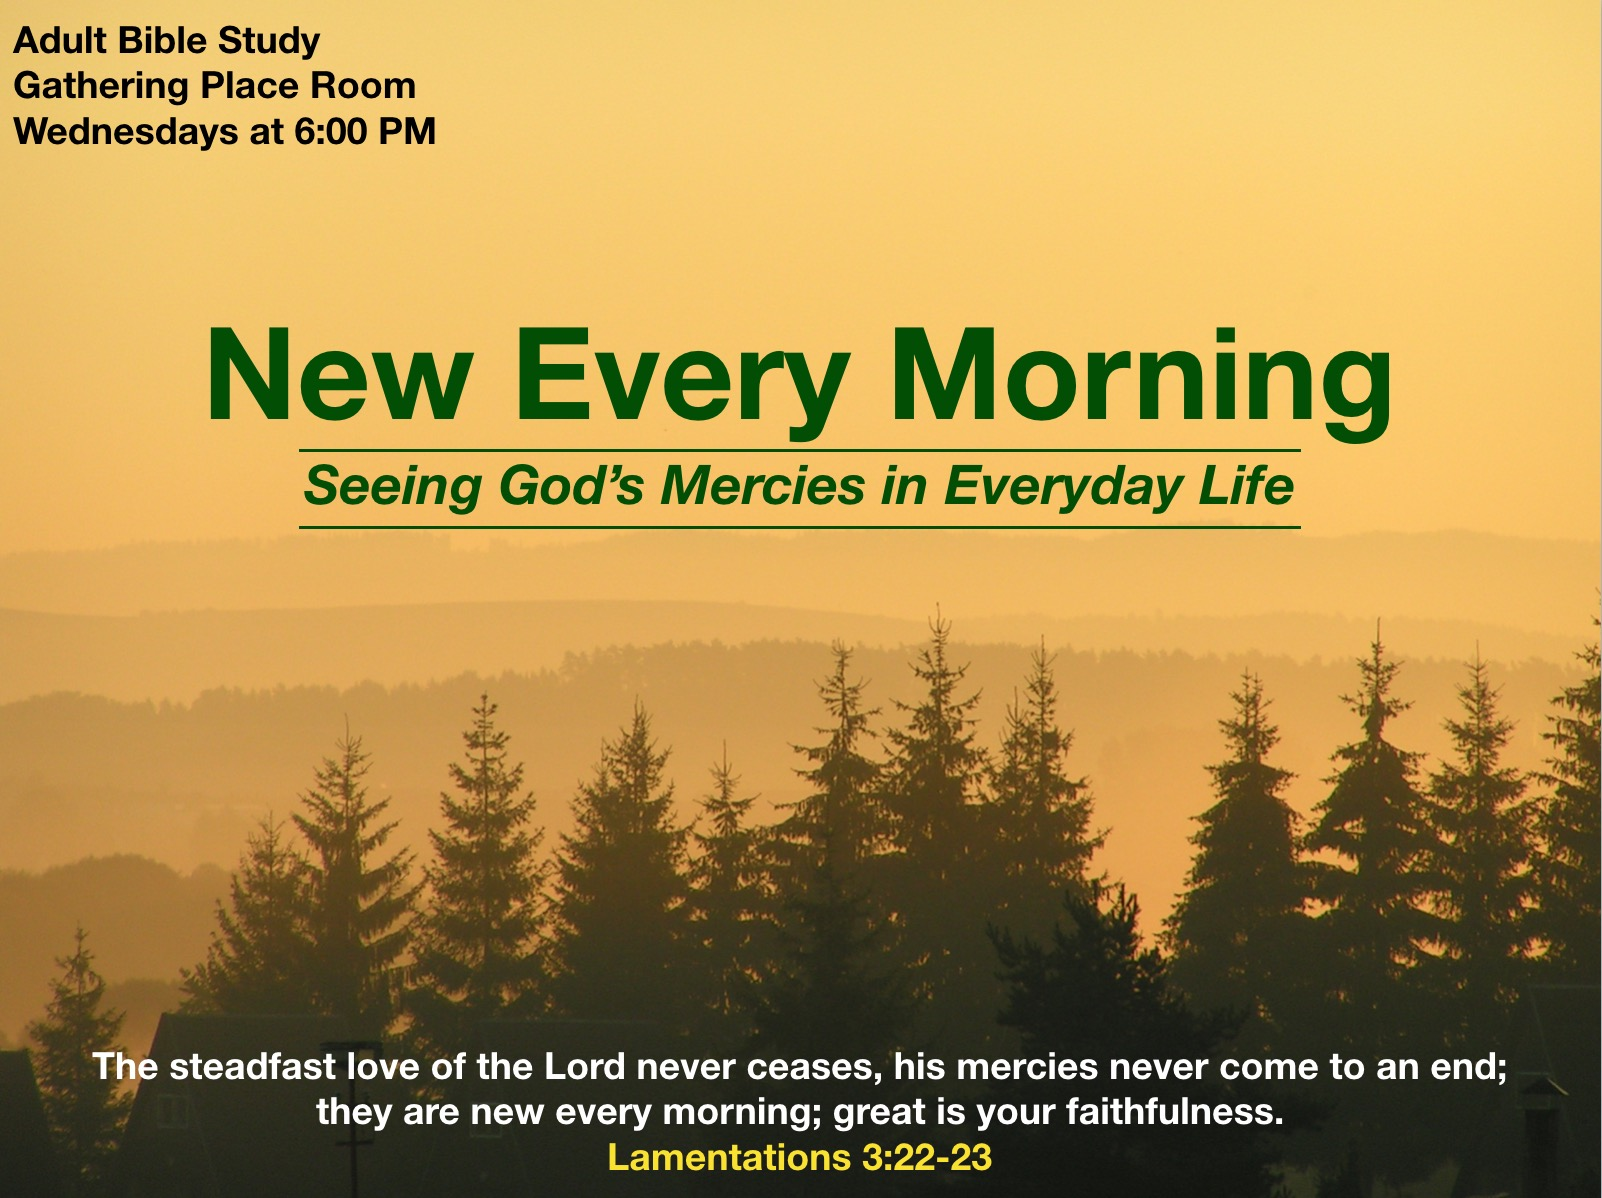 New Every Morning - Adult Bible Study Fall 2019.jpeg